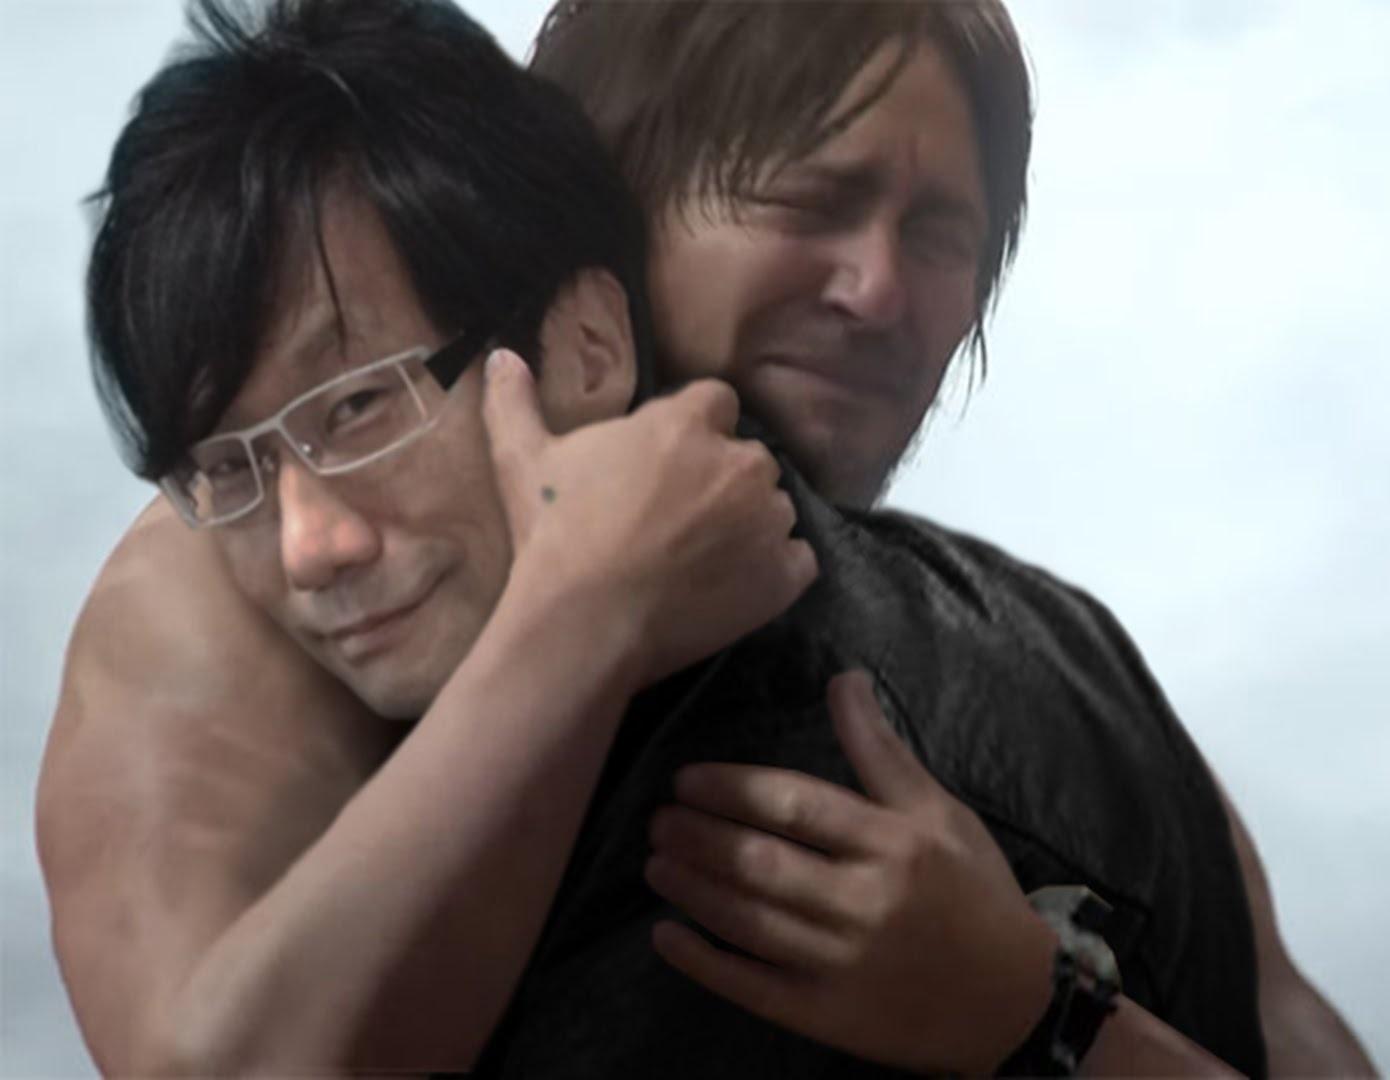 Death-Stranding-Hideo-hug